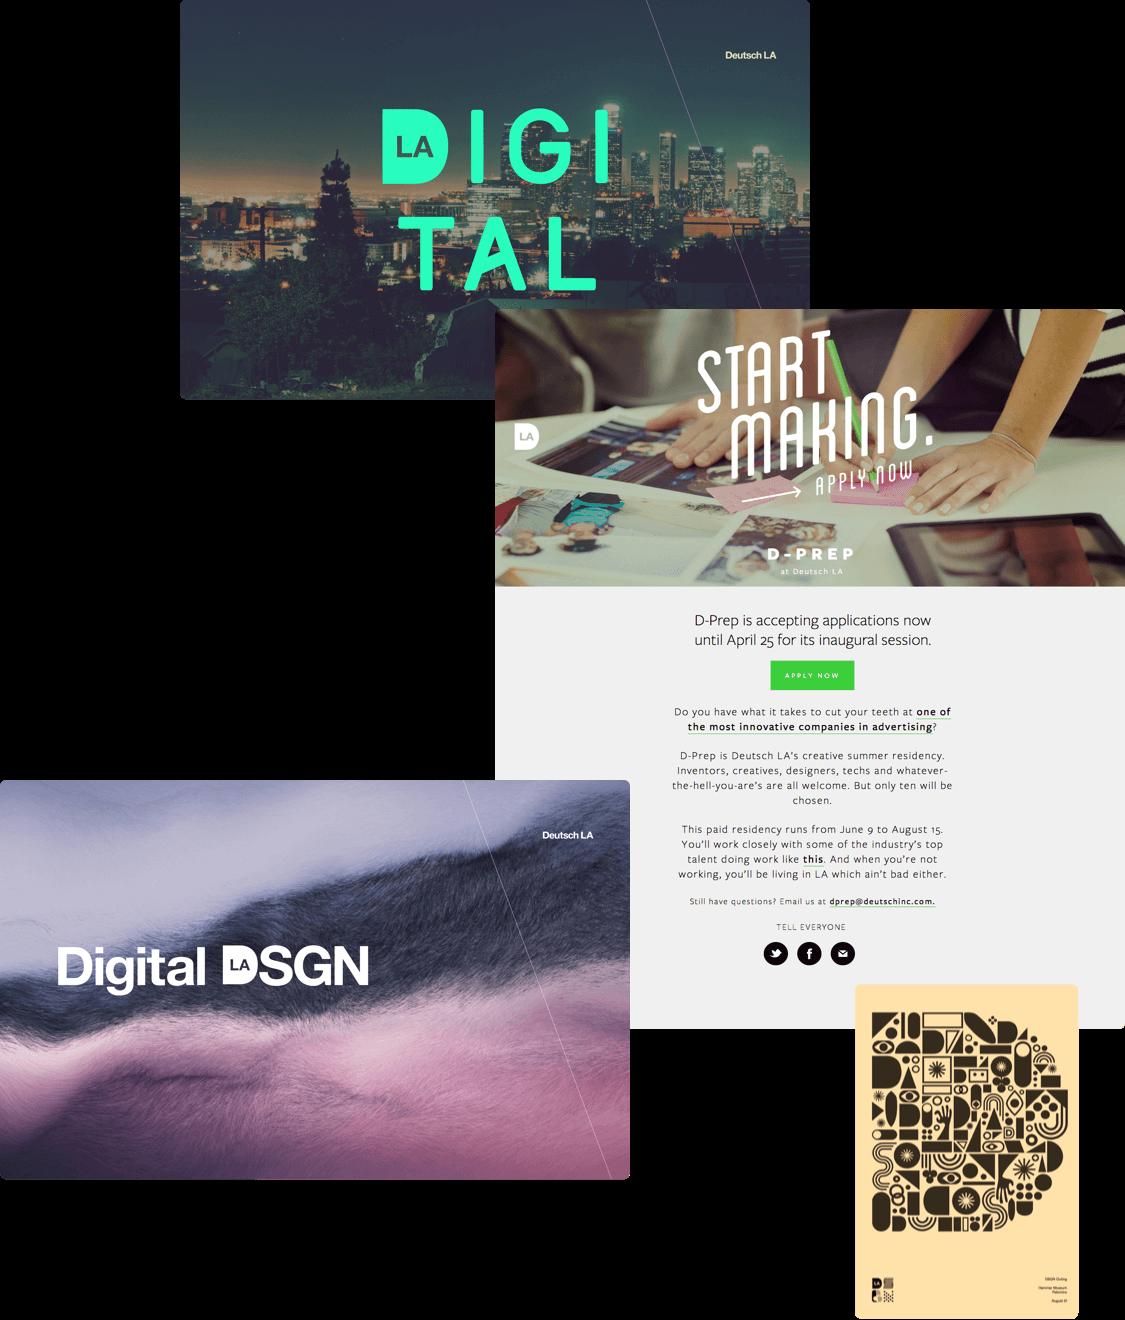 DLA_DigitalDSGN